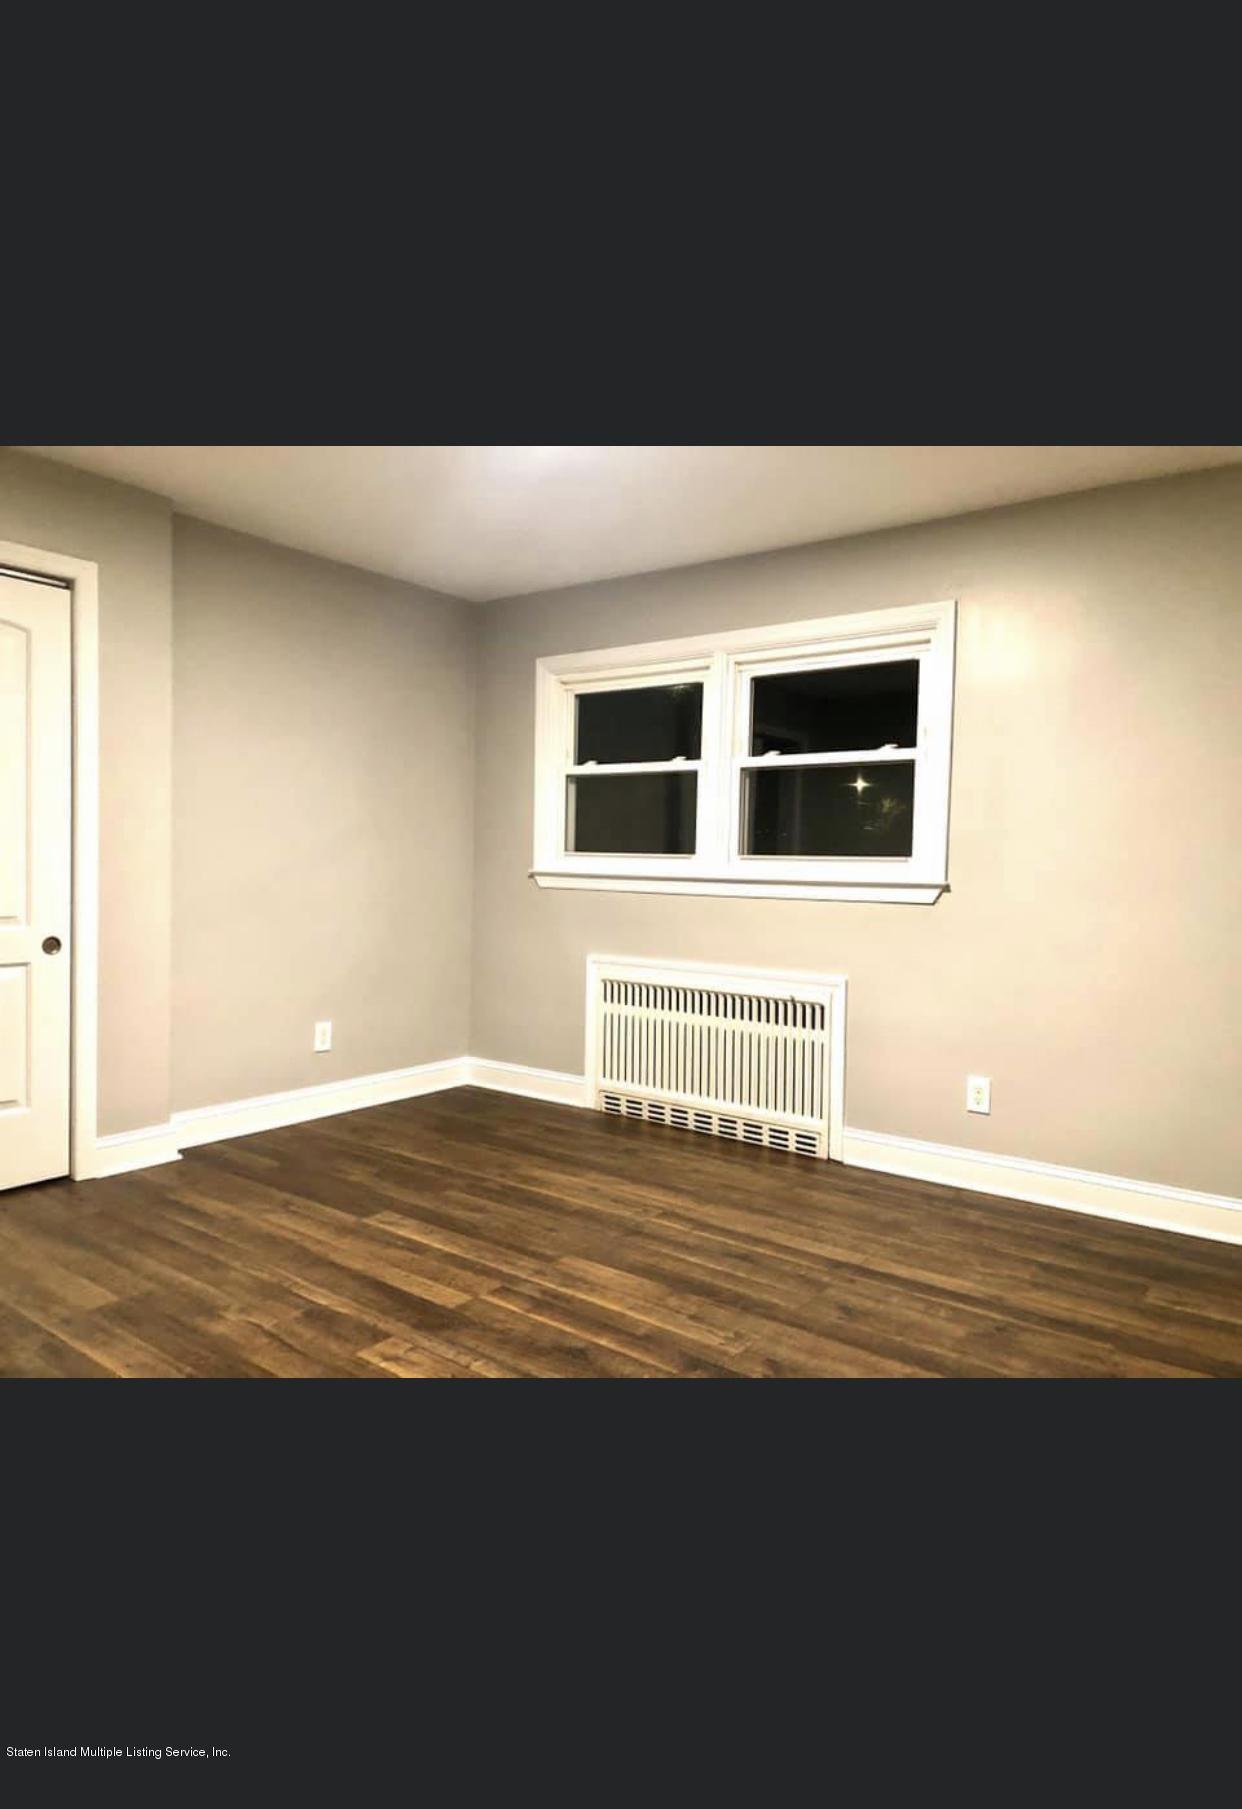 #2 156 Kensington Avenue,Staten Island,New York,10305,United States,3 Bedrooms Bedrooms,5 Rooms Rooms,1 BathroomBathrooms,Res-Rental,Kensington,1135605